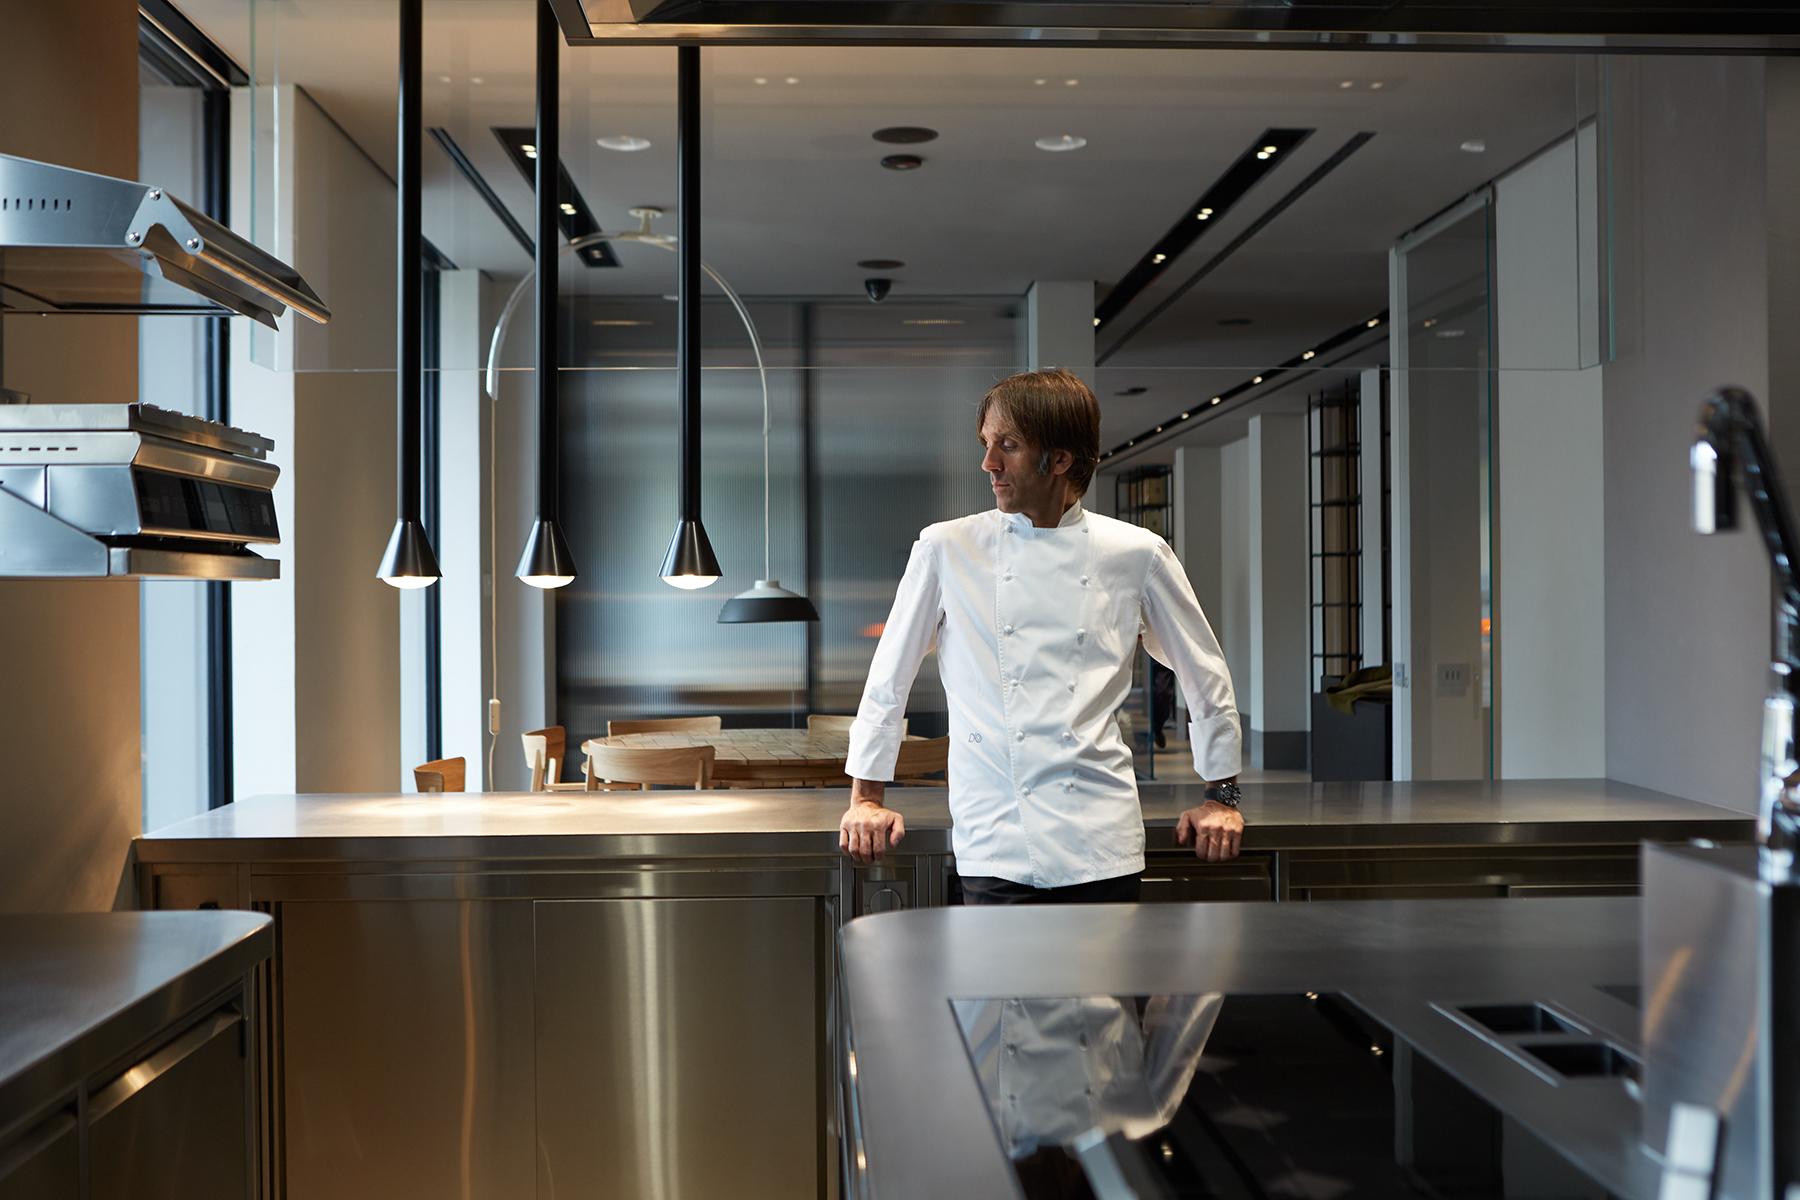 La cucina di oldani